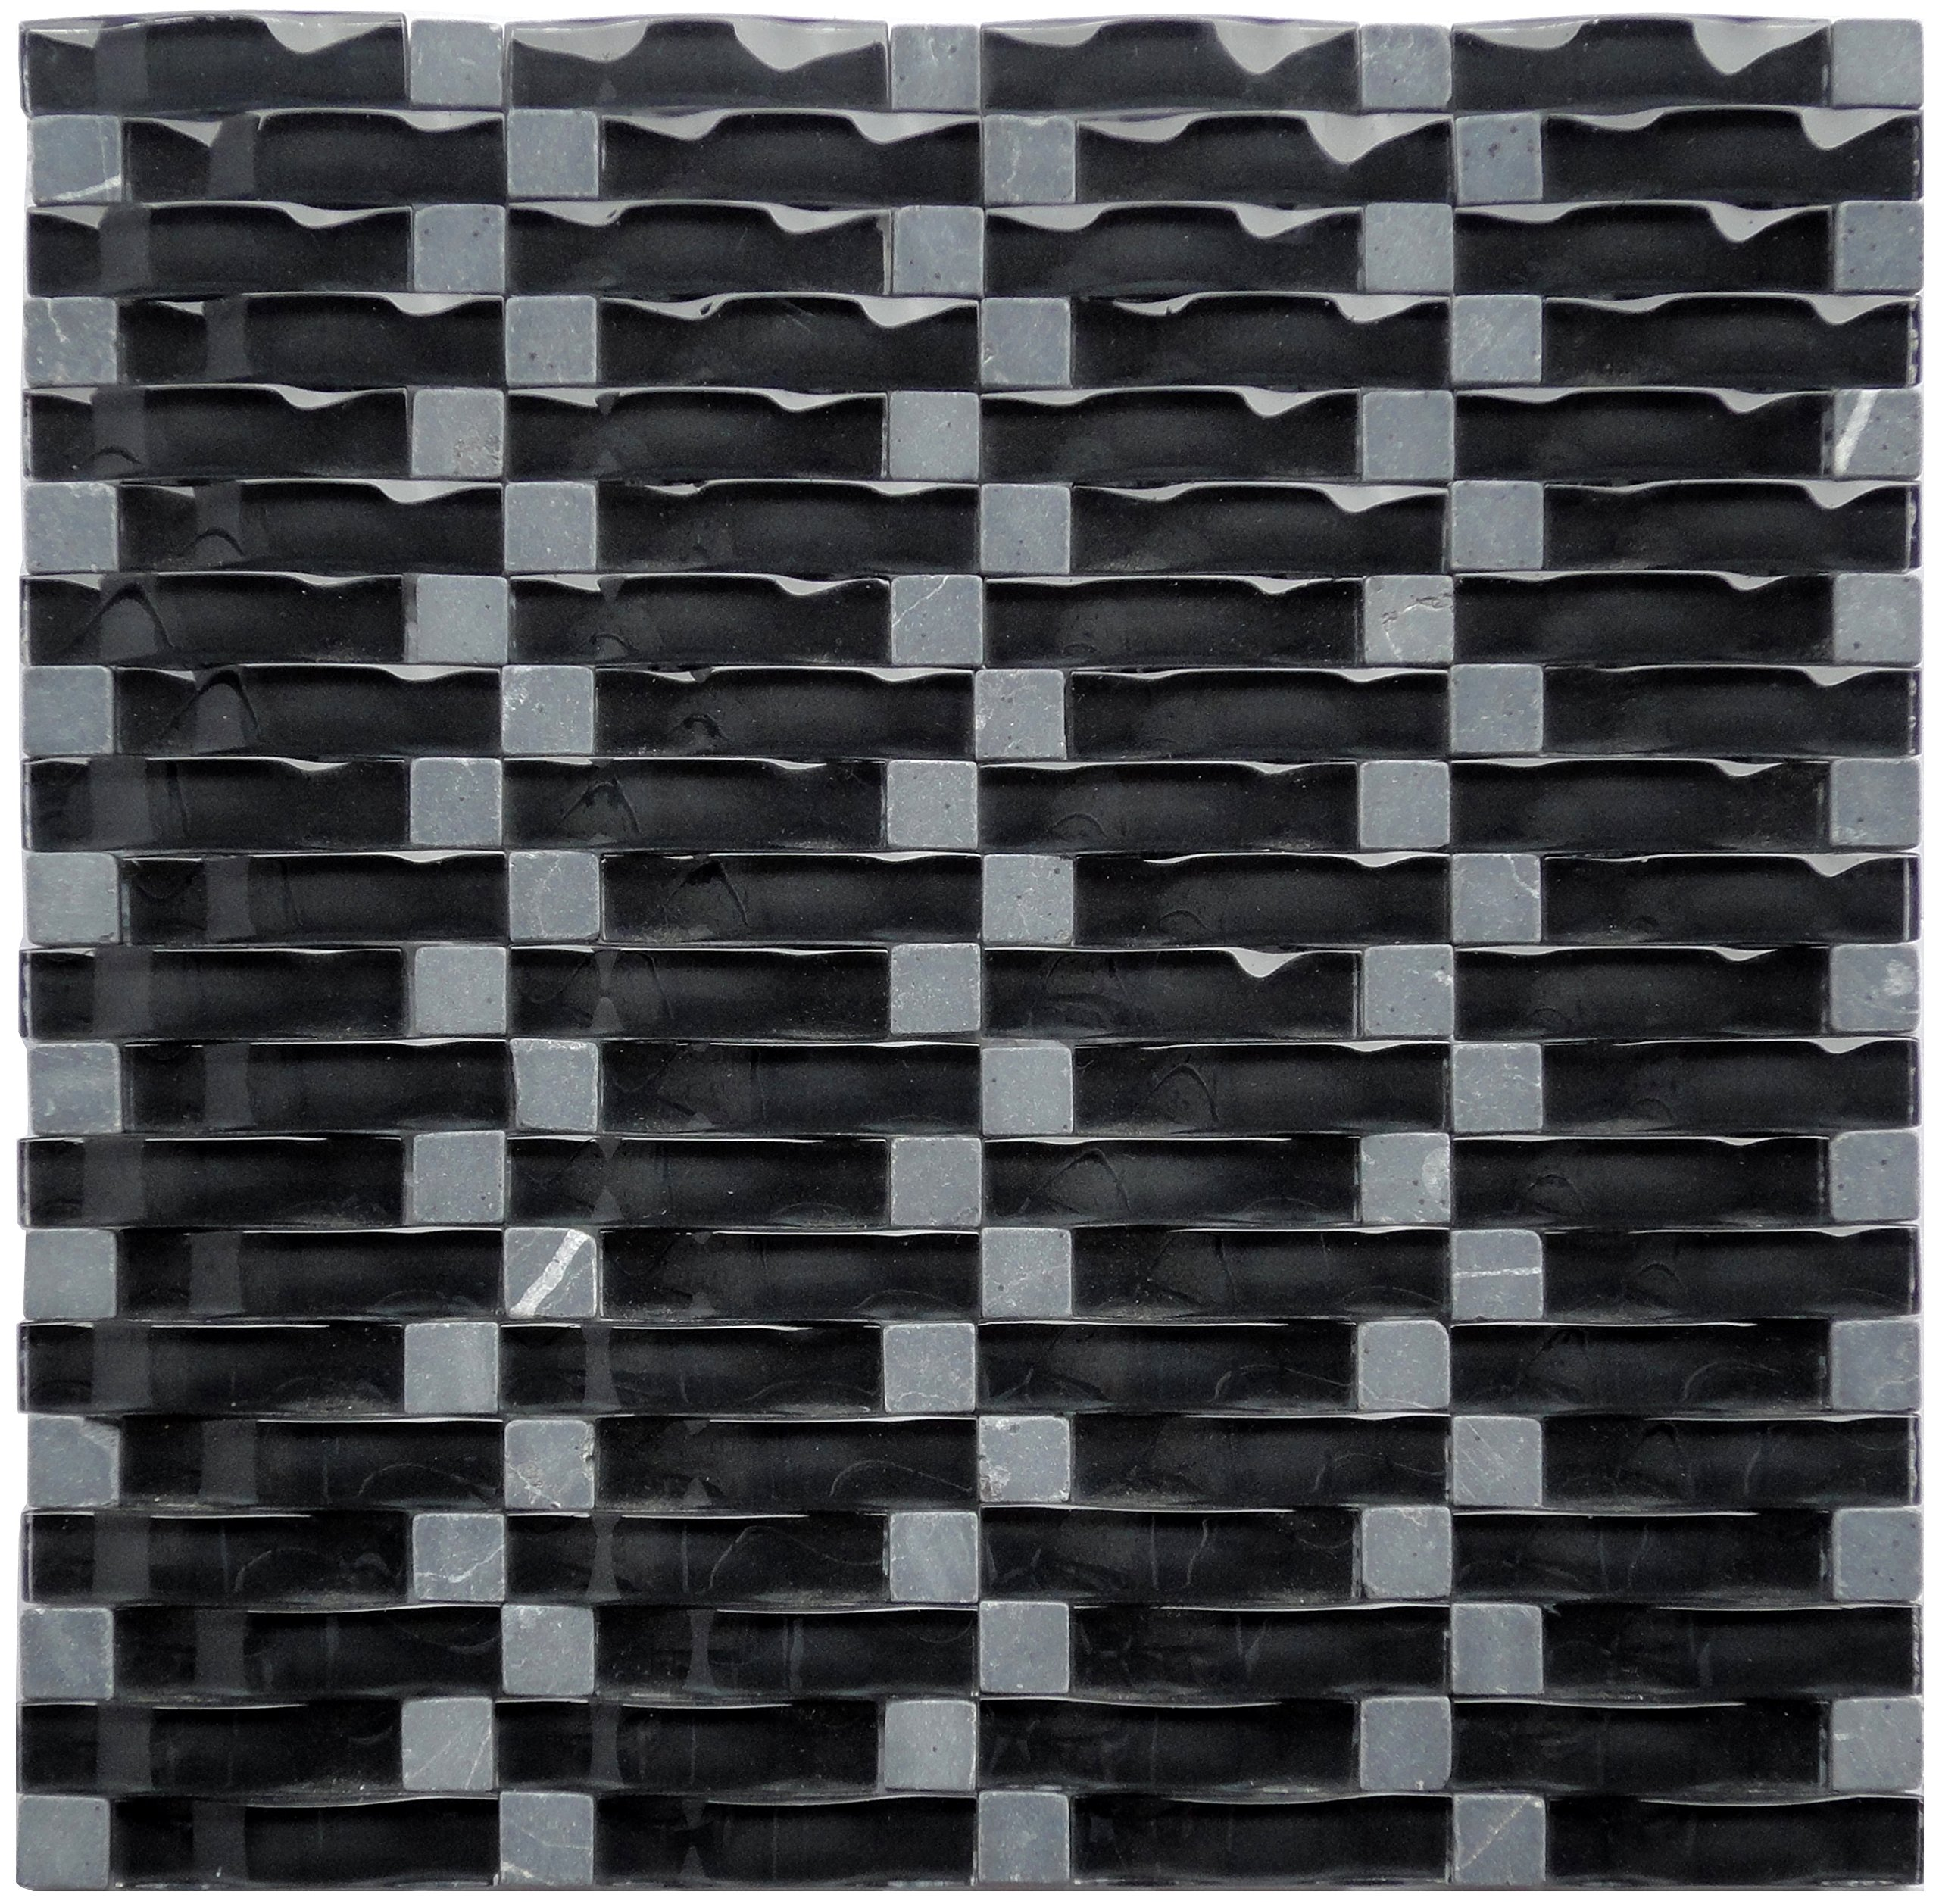 Black Obsidian Ripple Series 3D Wave Backsplash Glass Stone Mosaic Tile for Kitchen Bathroom (1 Box / 8 Sheets)